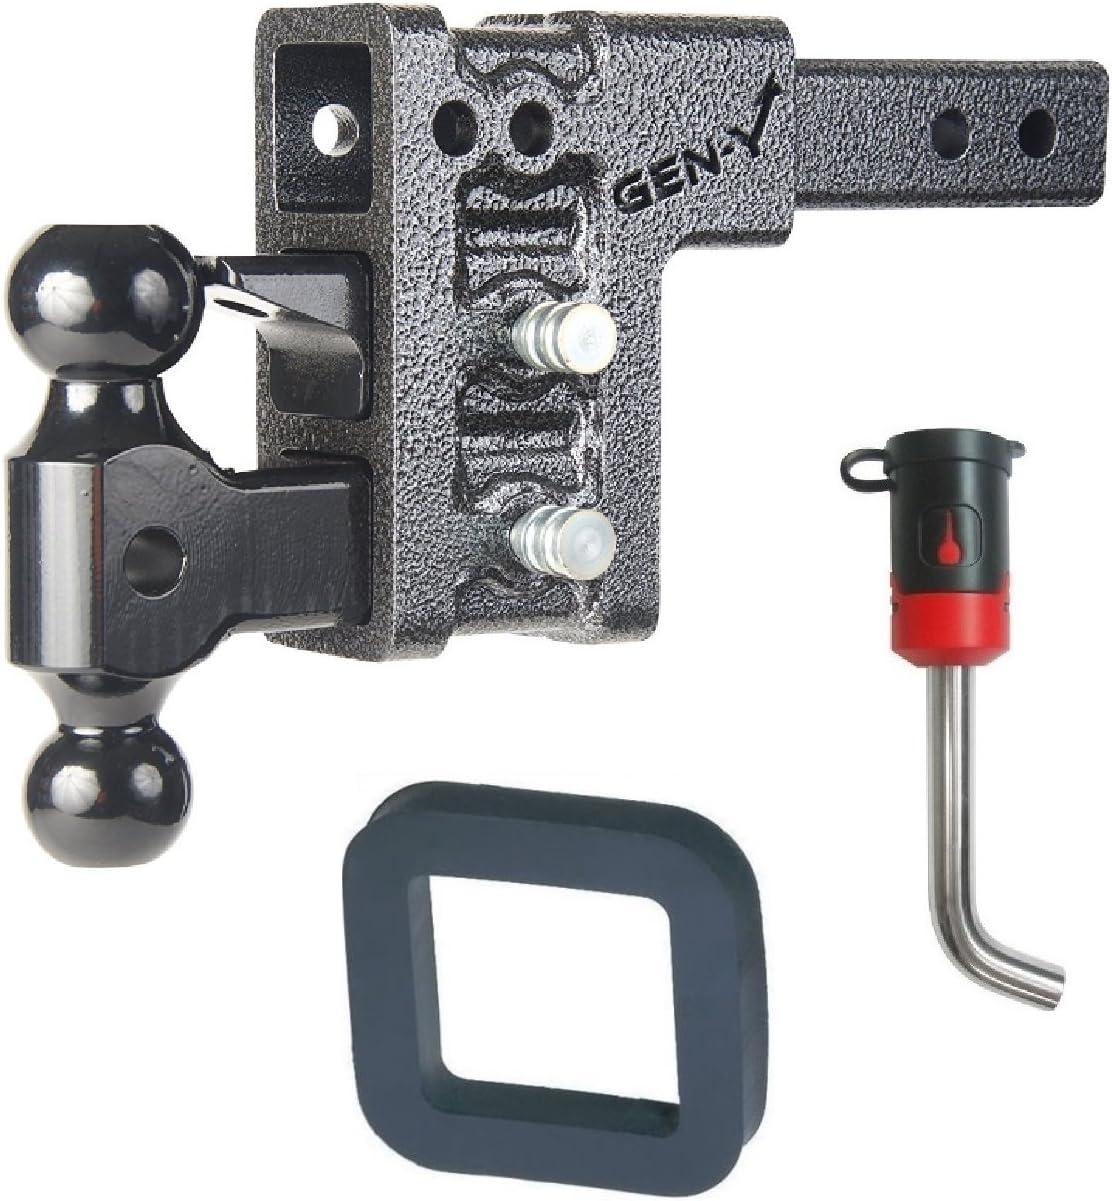 GEN-Y Hitch GH-323 Class IV 2 Receiver 5 Drop Hitch 10K Towing w// 2 Silencer Pad /& 5//8 Receiver Lock Bundle for Dodge//Jeep//Ram Keys